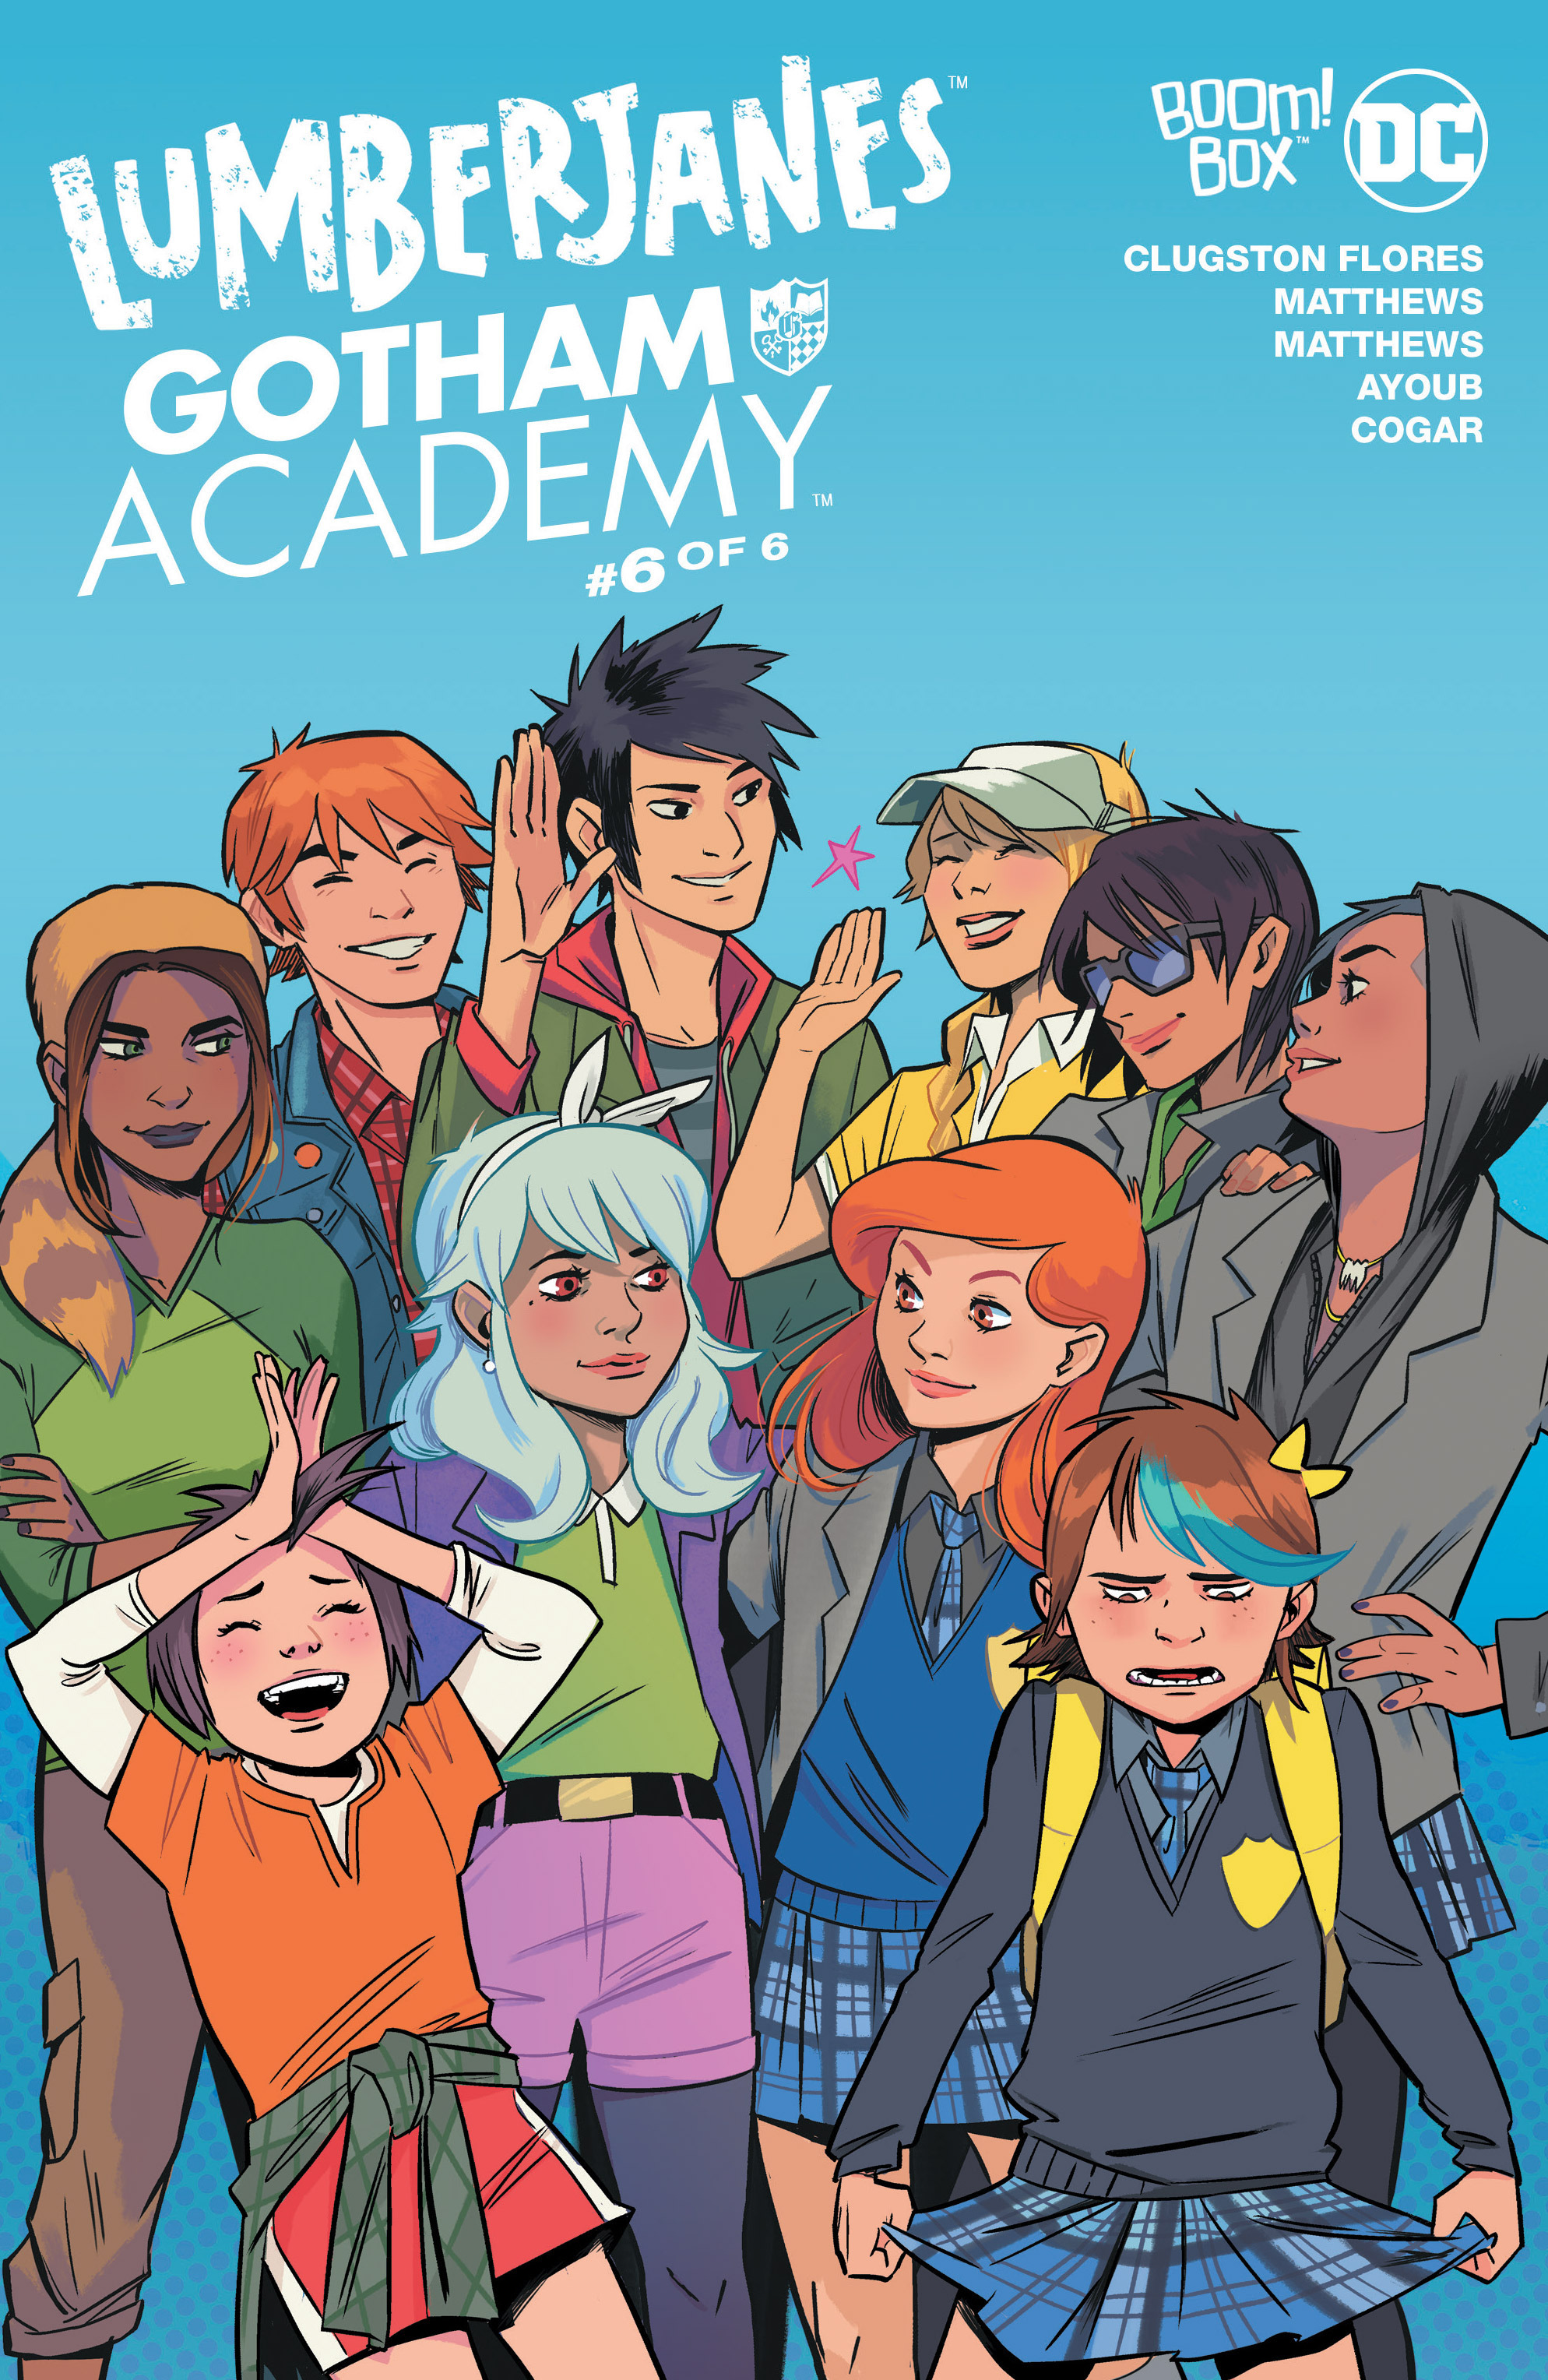 Lumberjanes/Gotham Academy 6 Page 1